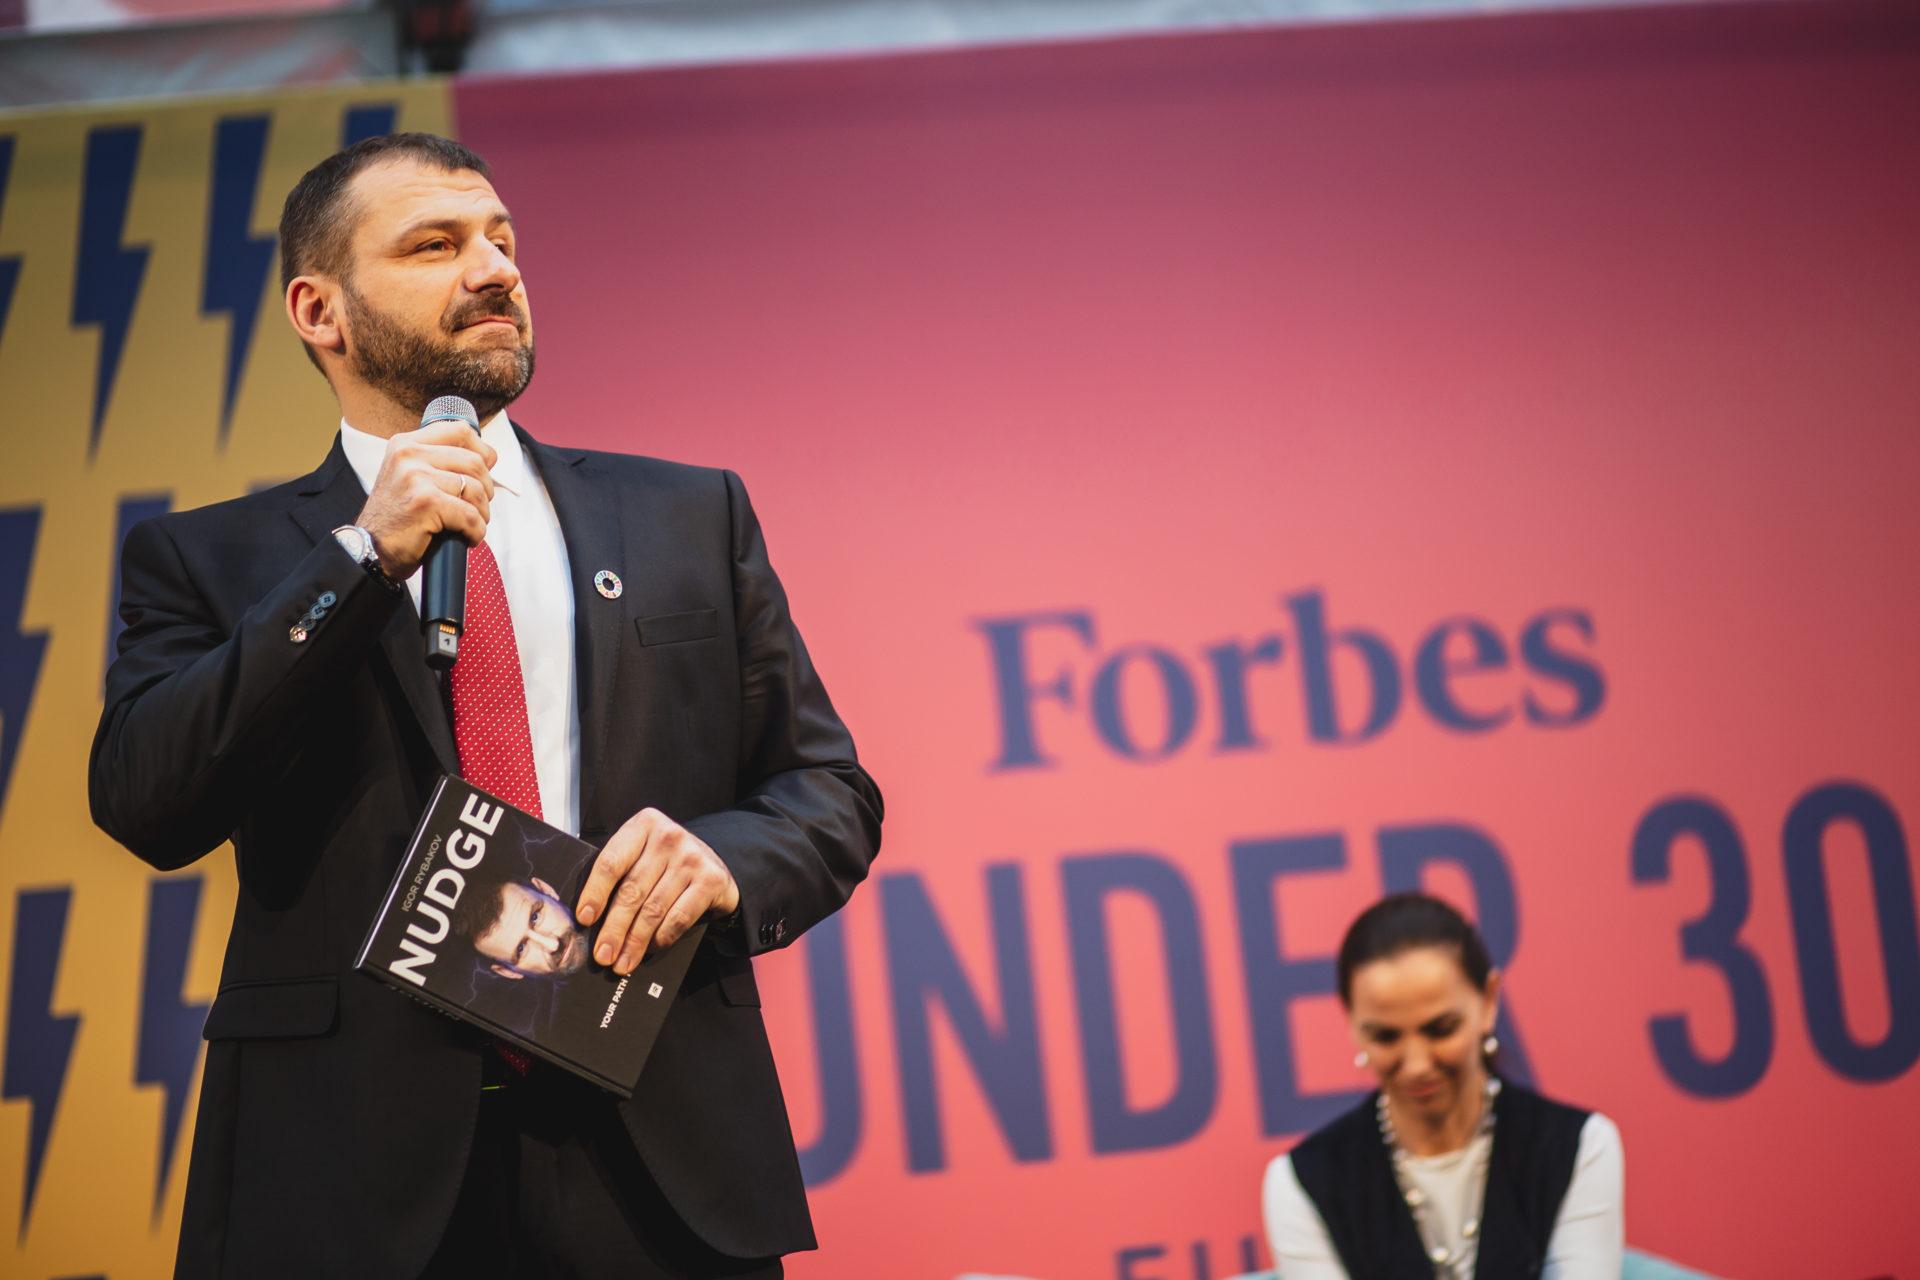 Igor-Rybakov_FORBES-U30_151307_Carolin-Weinkopf